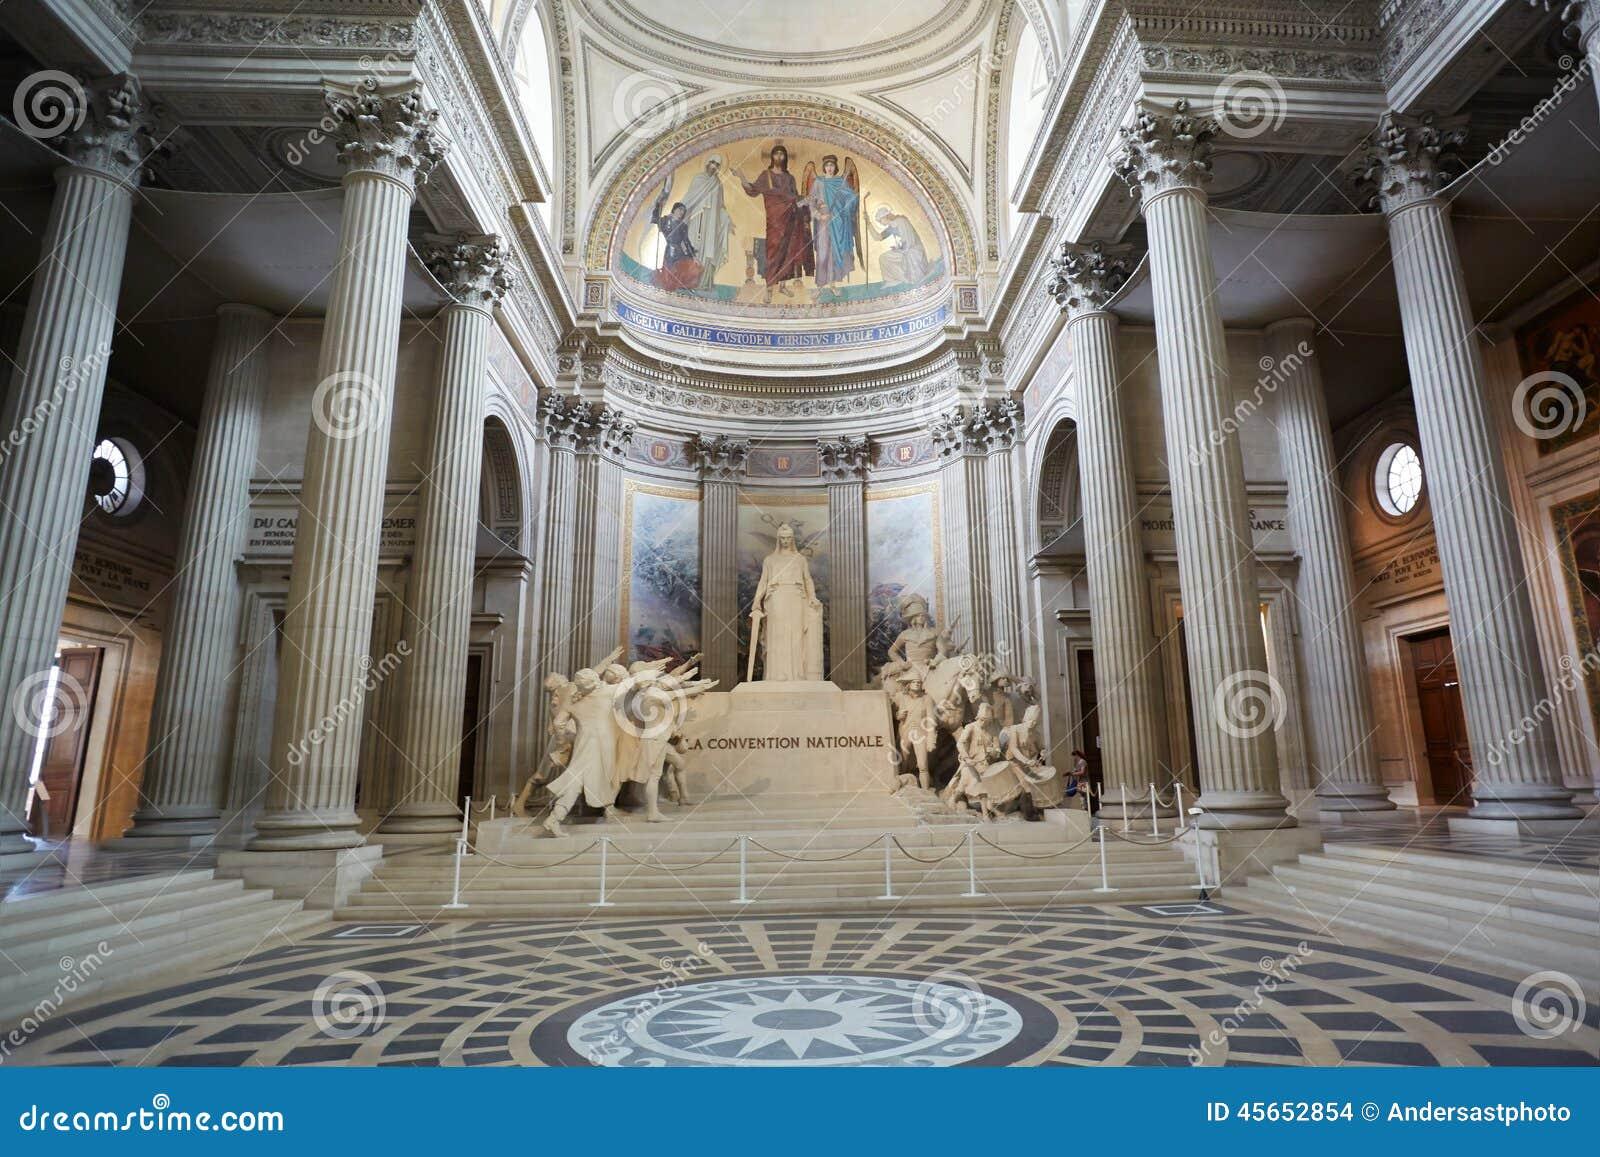 pantheon interior in paris france editorial stock image image 45652854. Black Bedroom Furniture Sets. Home Design Ideas